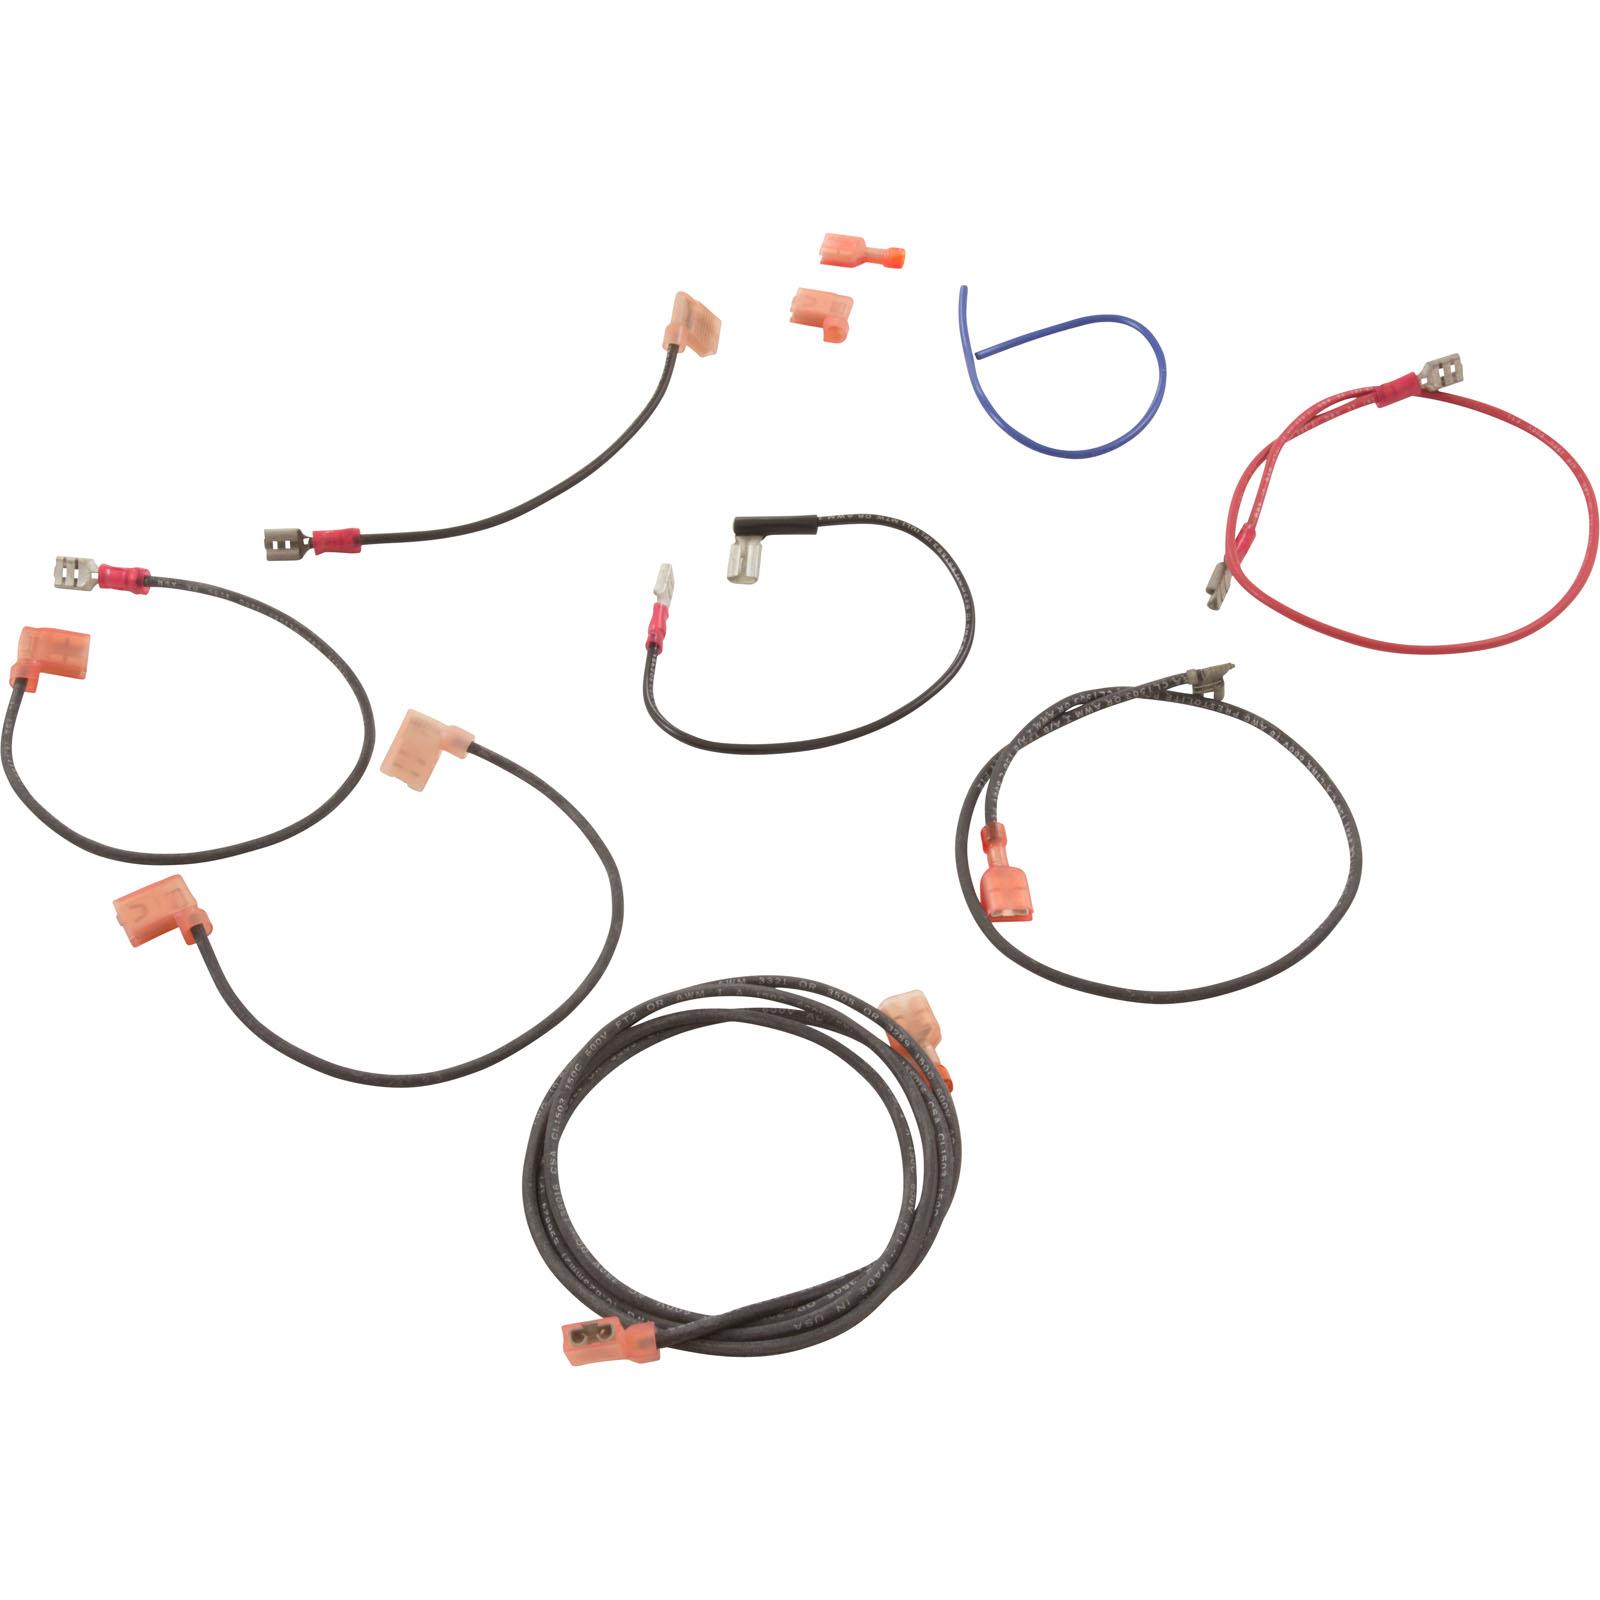 Wiring Harness, Raypak, Model 155, Millivolt 840891006985